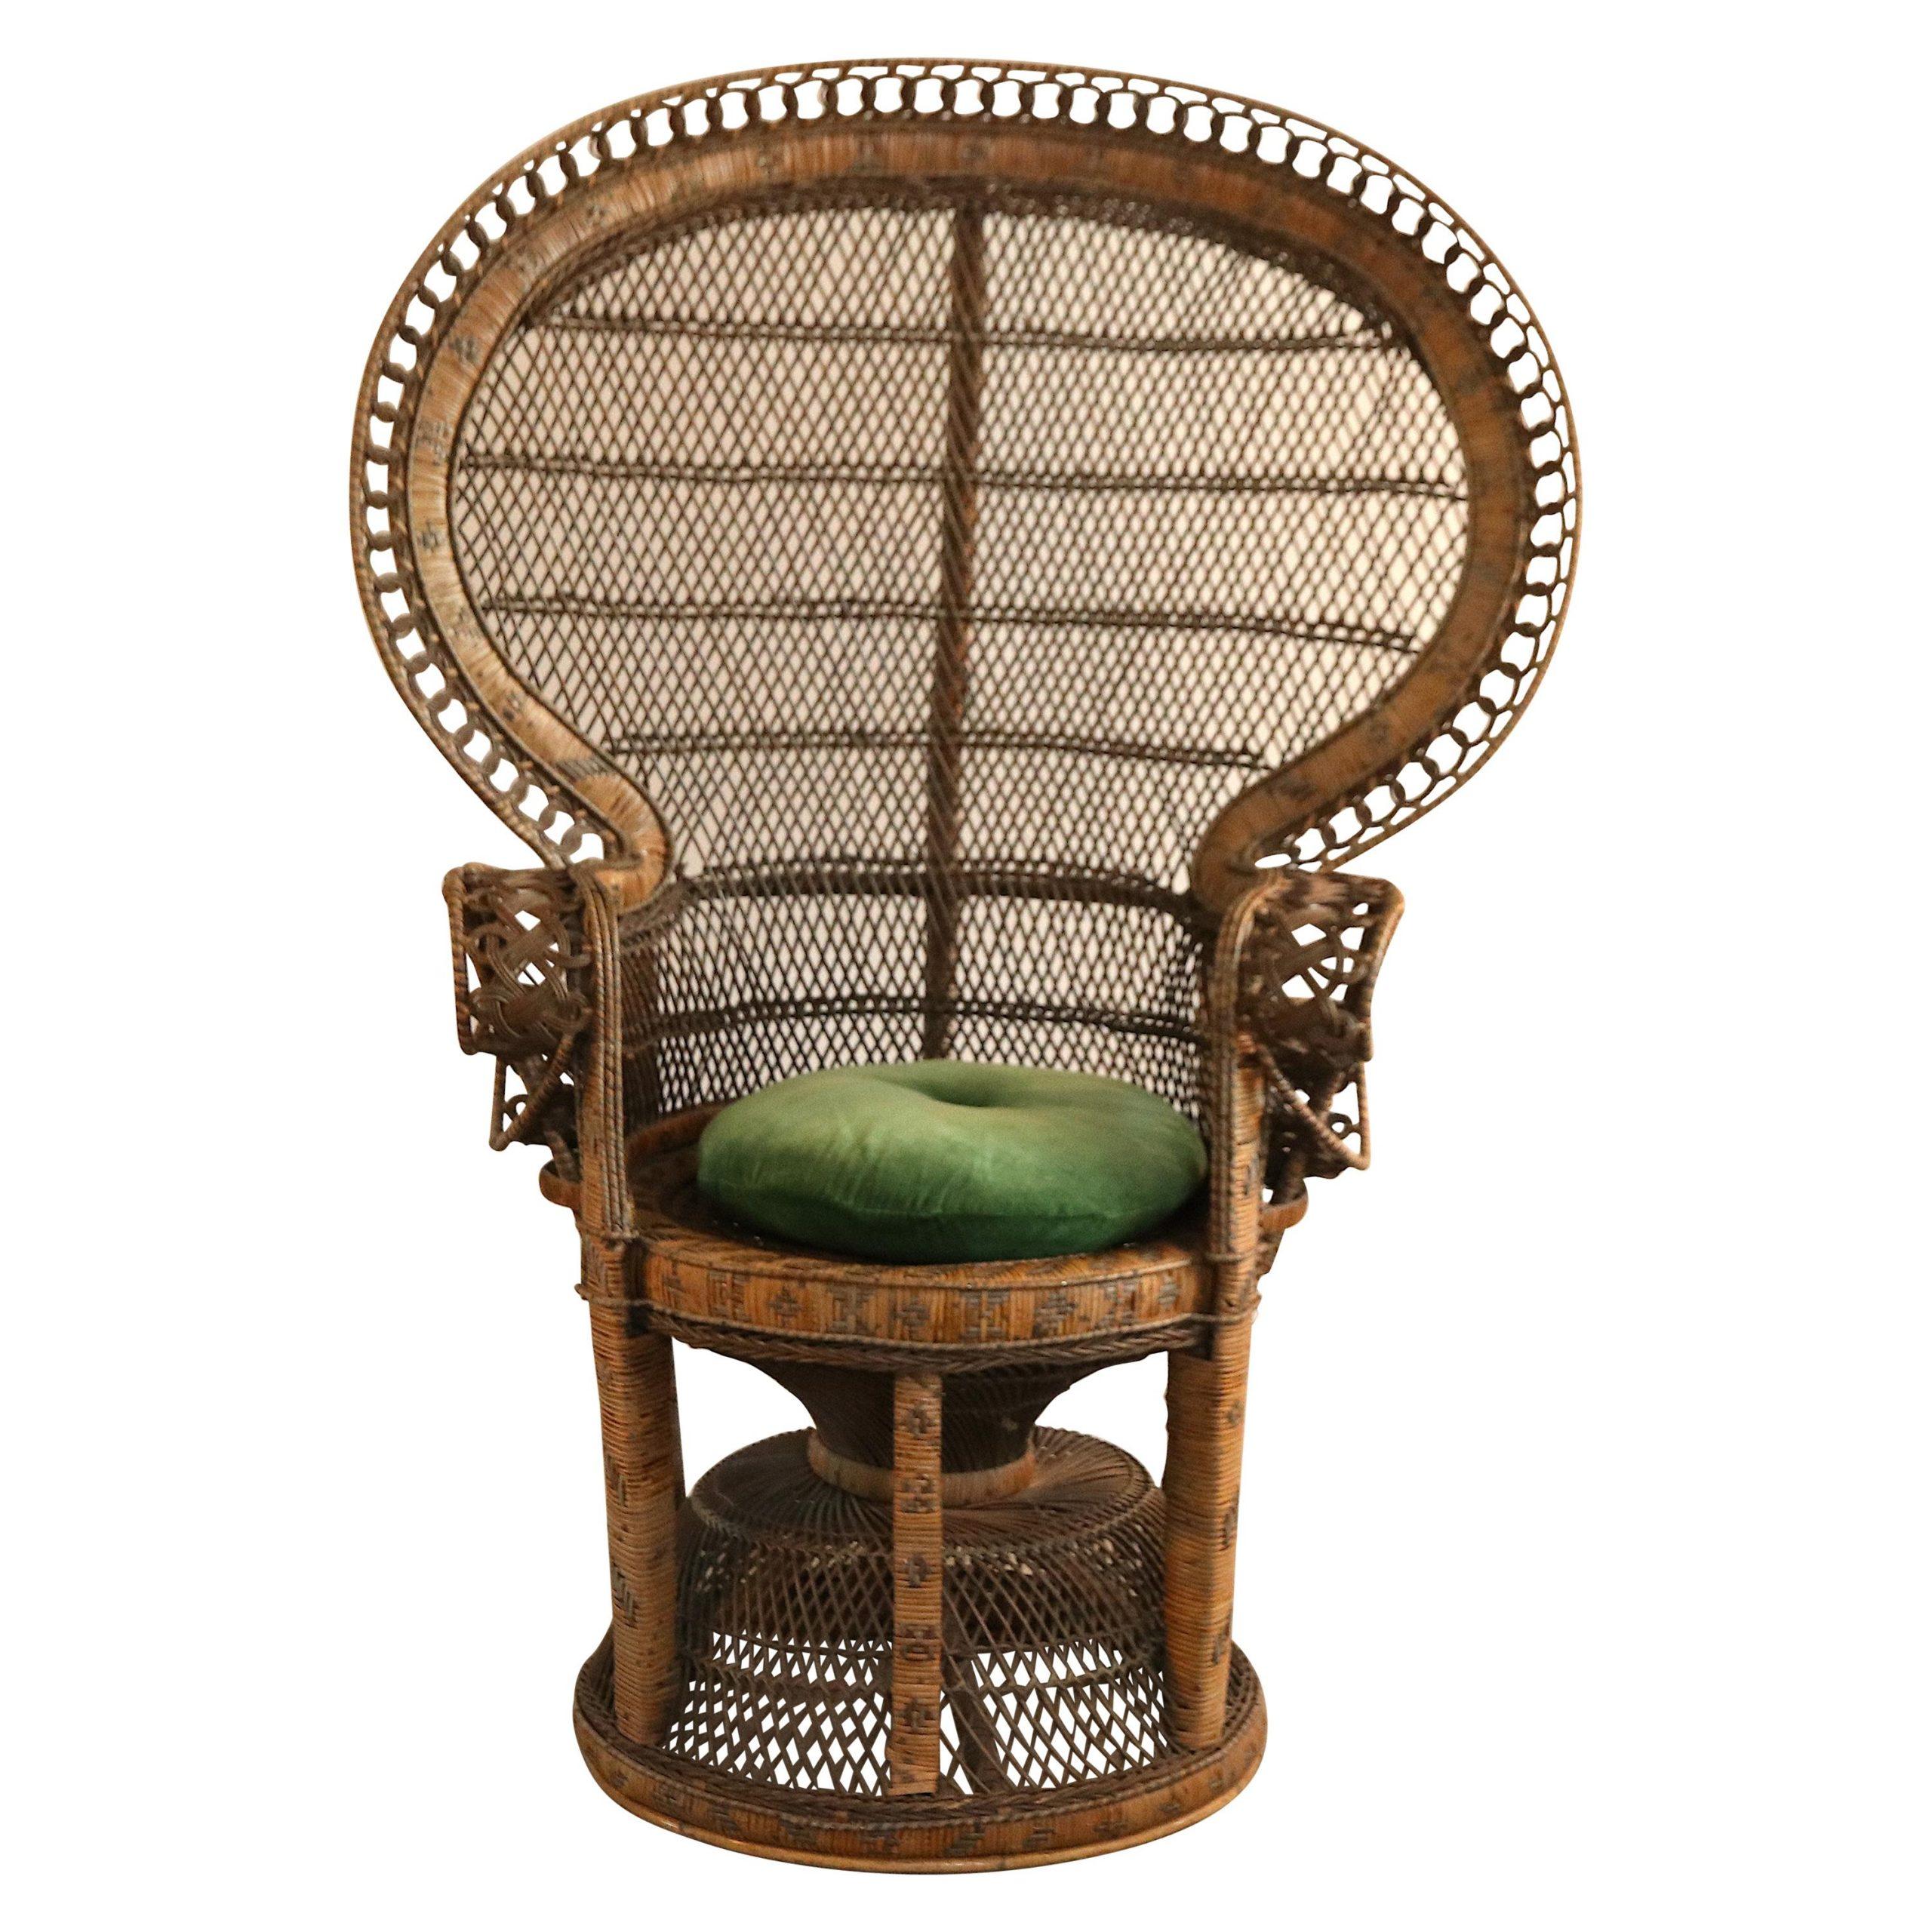 Park Art My WordPress Blog_High Back Rattan Chairs For Sale